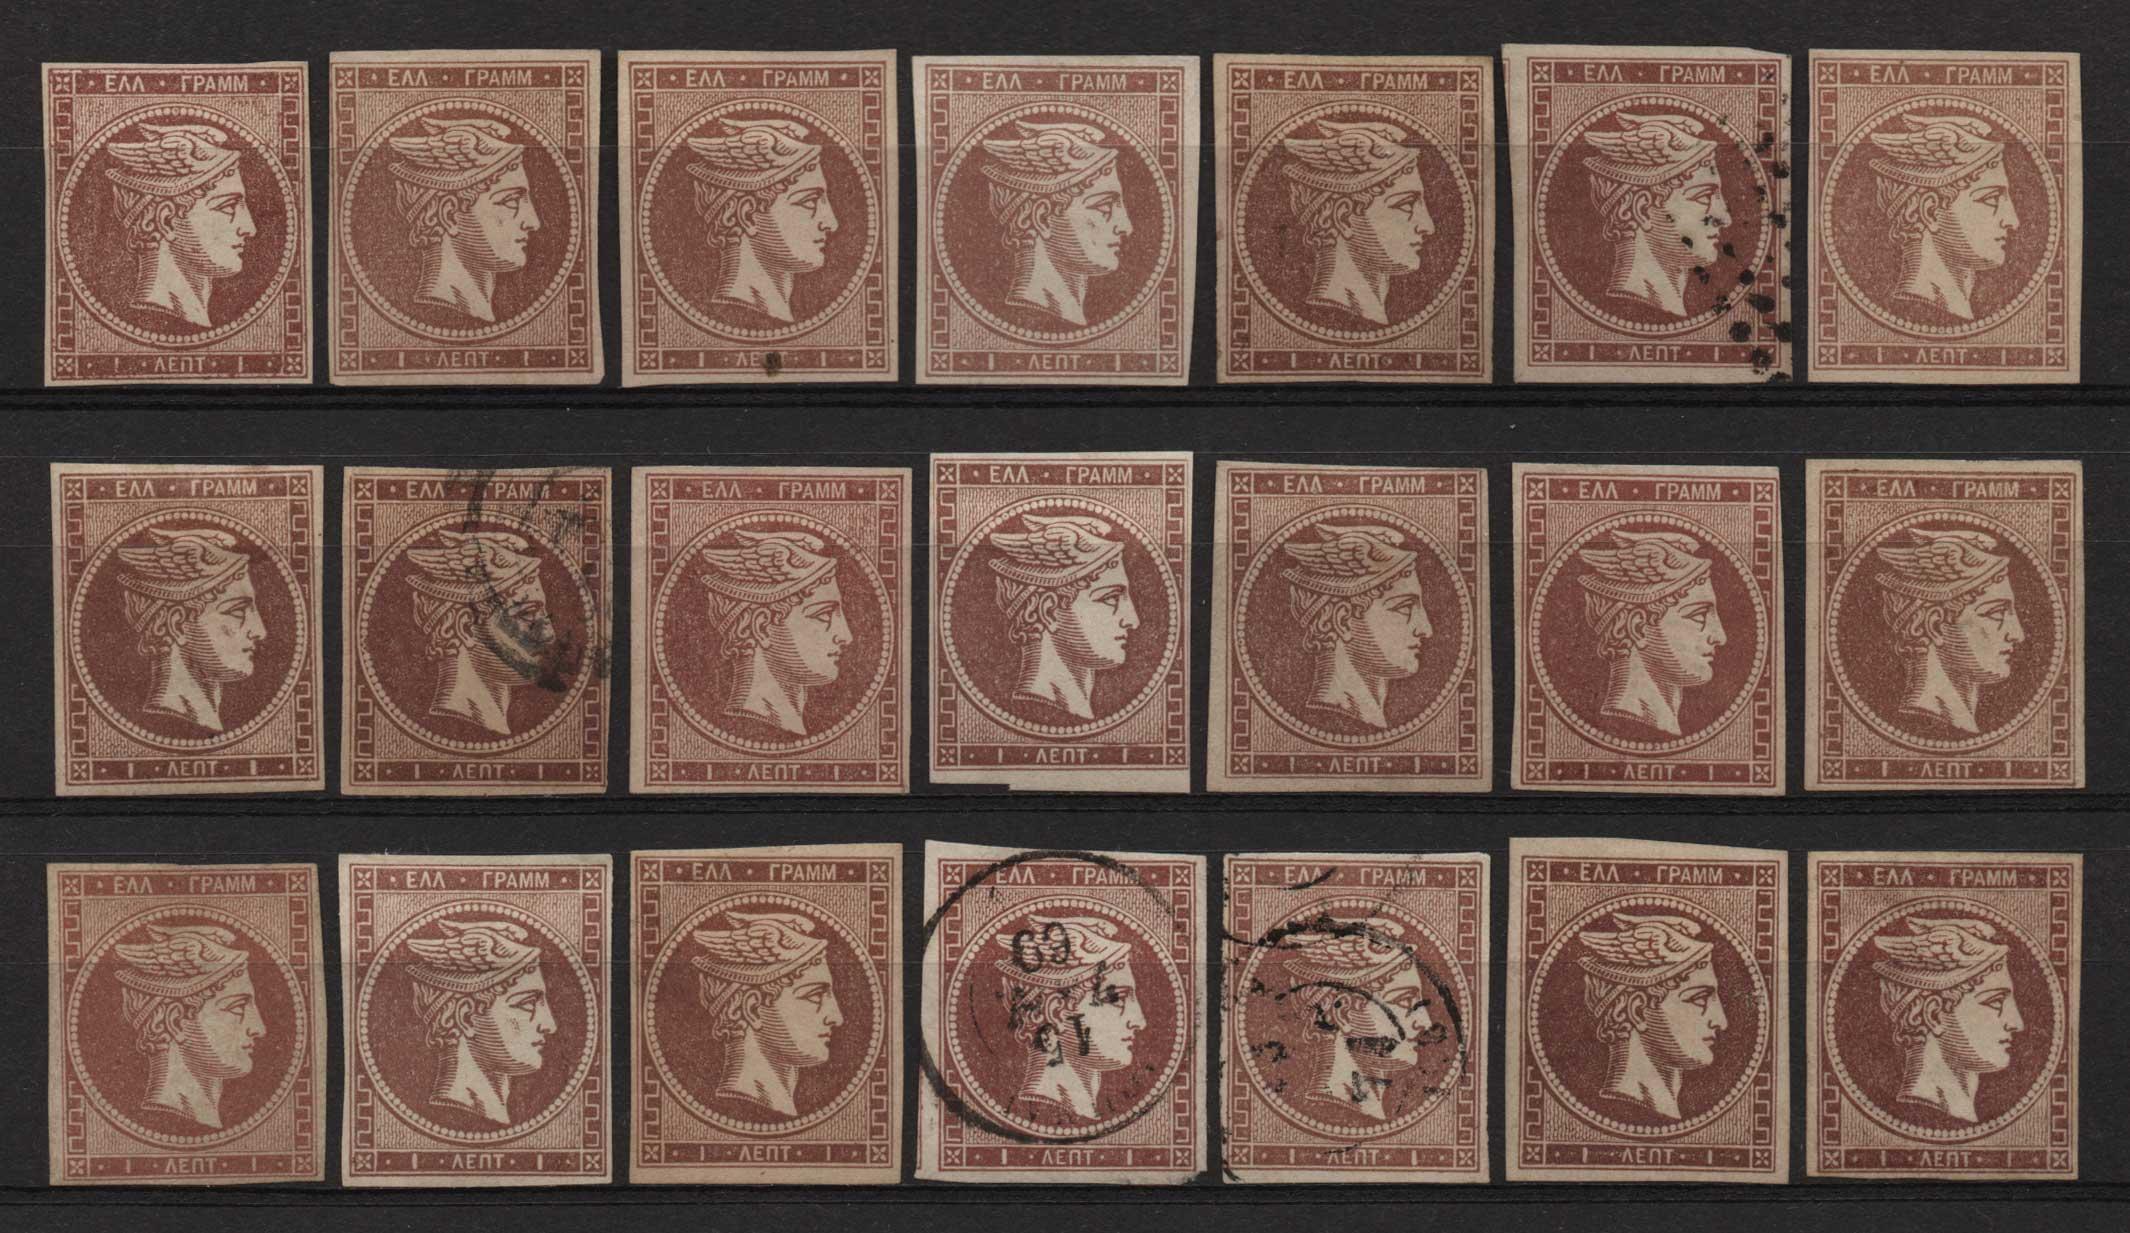 Lot 10 - -  LARGE HERMES HEAD large hermes head -  Athens Auctions Public Auction 70 General Stamp Sale